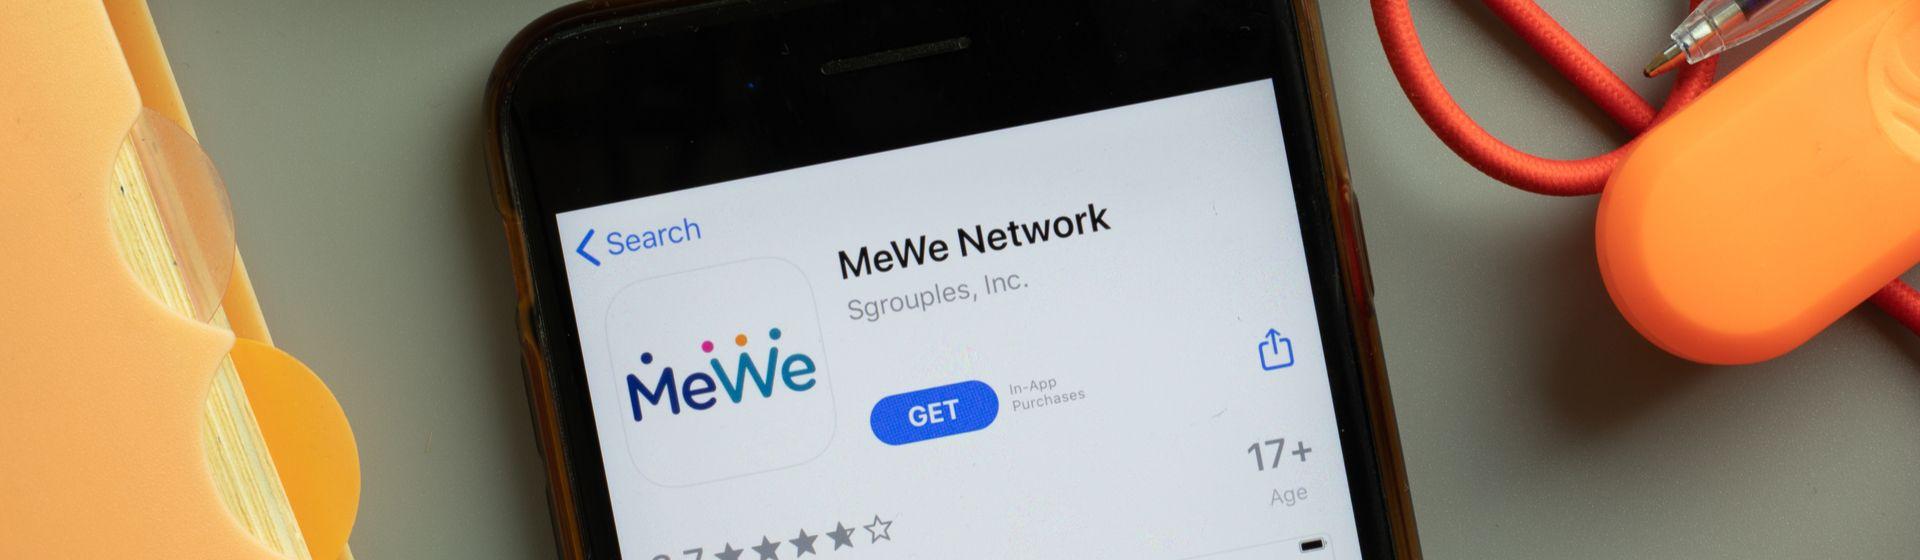 MeWe: o que é e como funciona a rede social que preserva seus dados